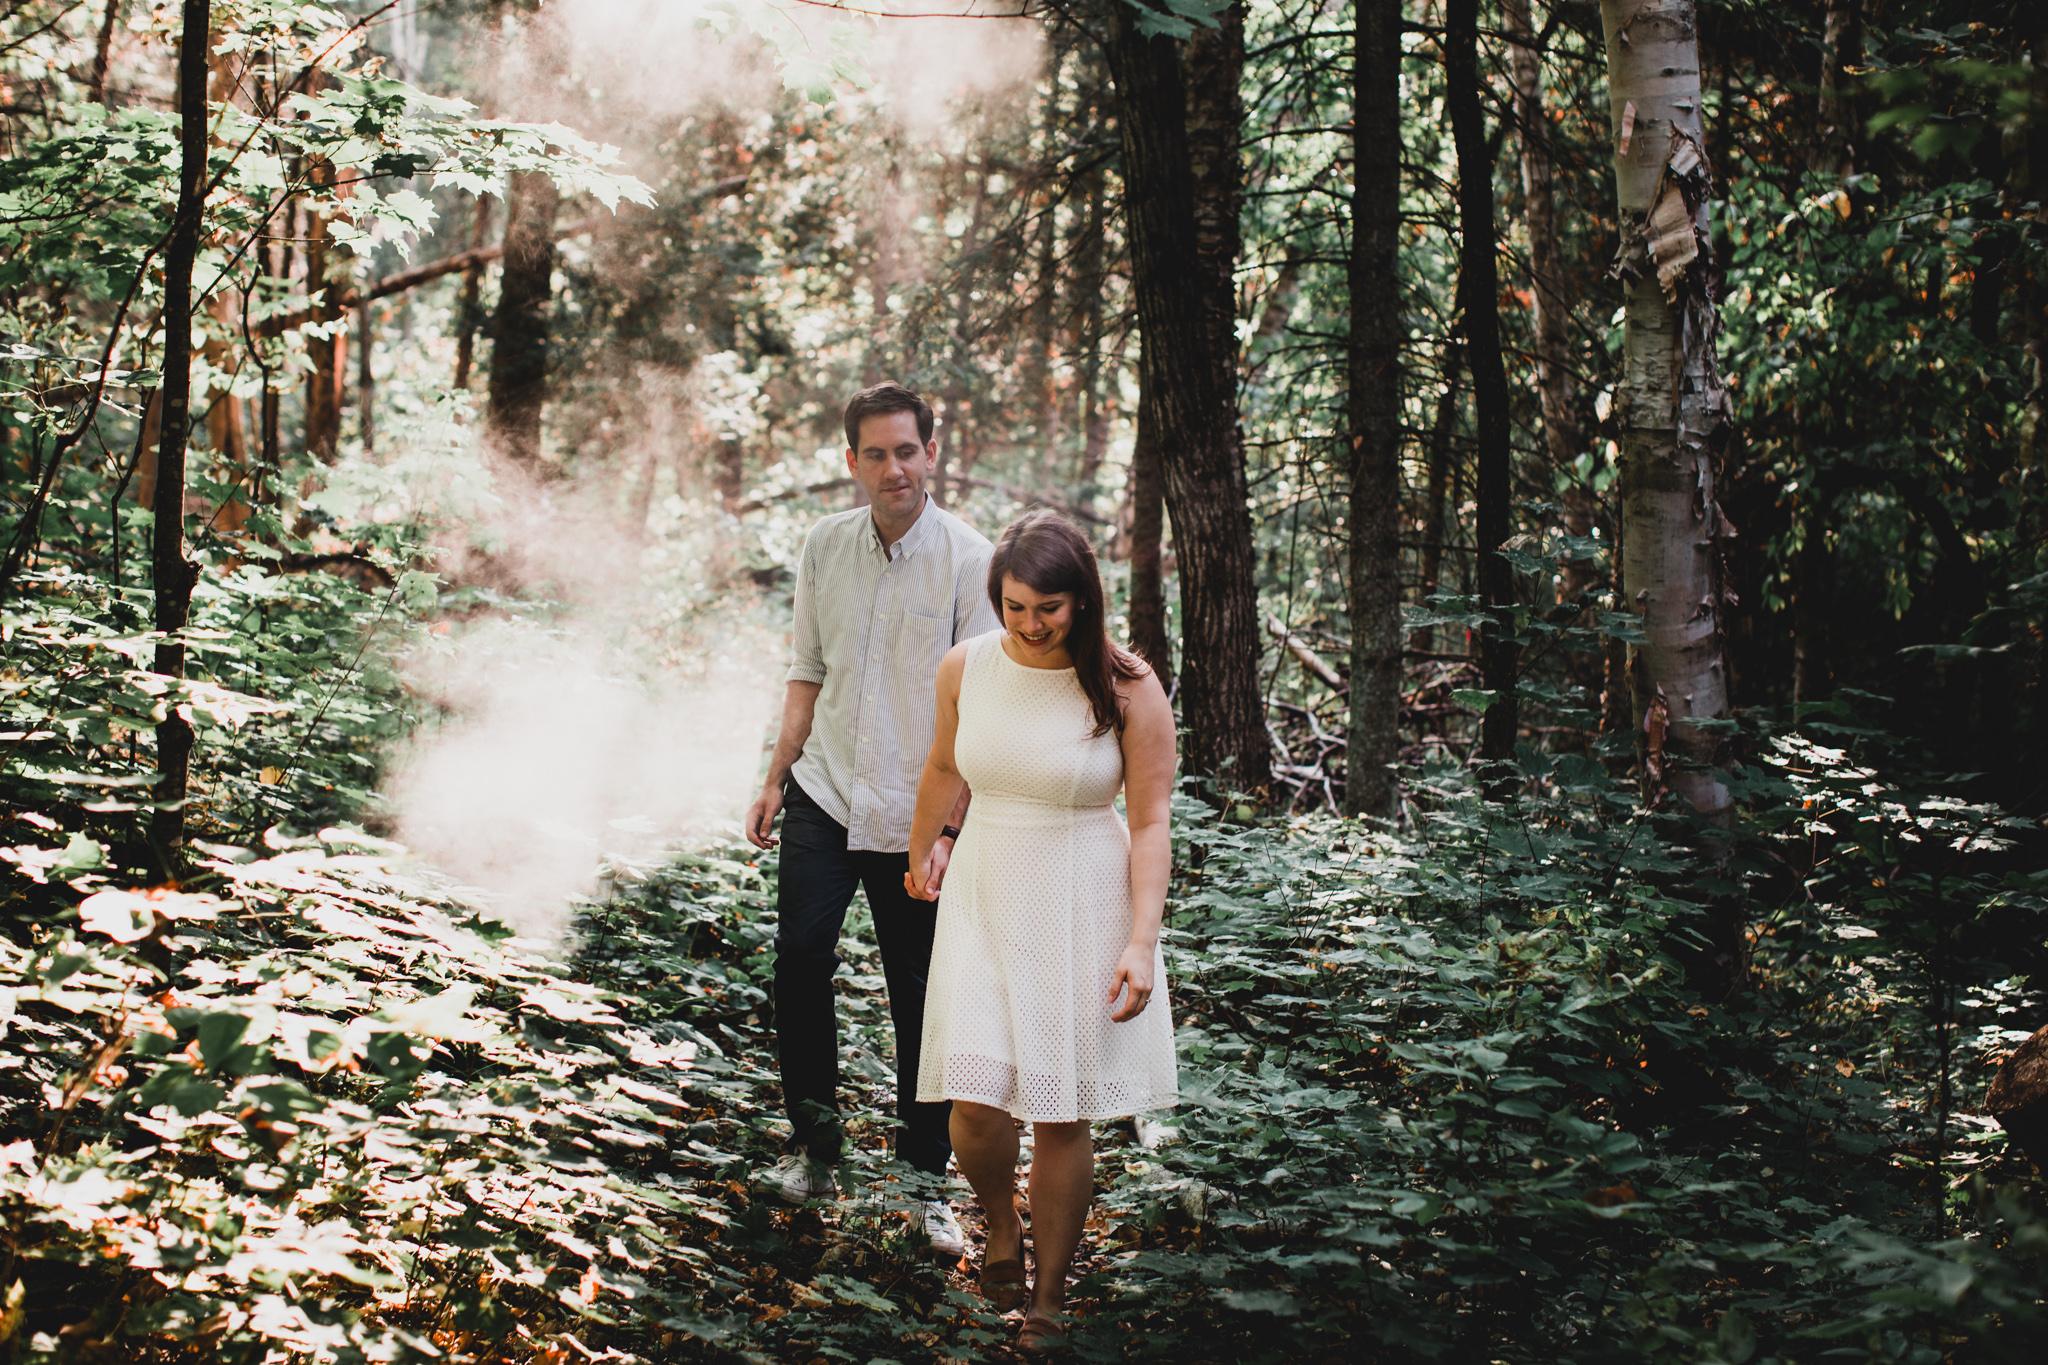 010-WEB-Jonathan-Kuhn-Photography-Rebecca-Emil-Engagement-4420.jpg